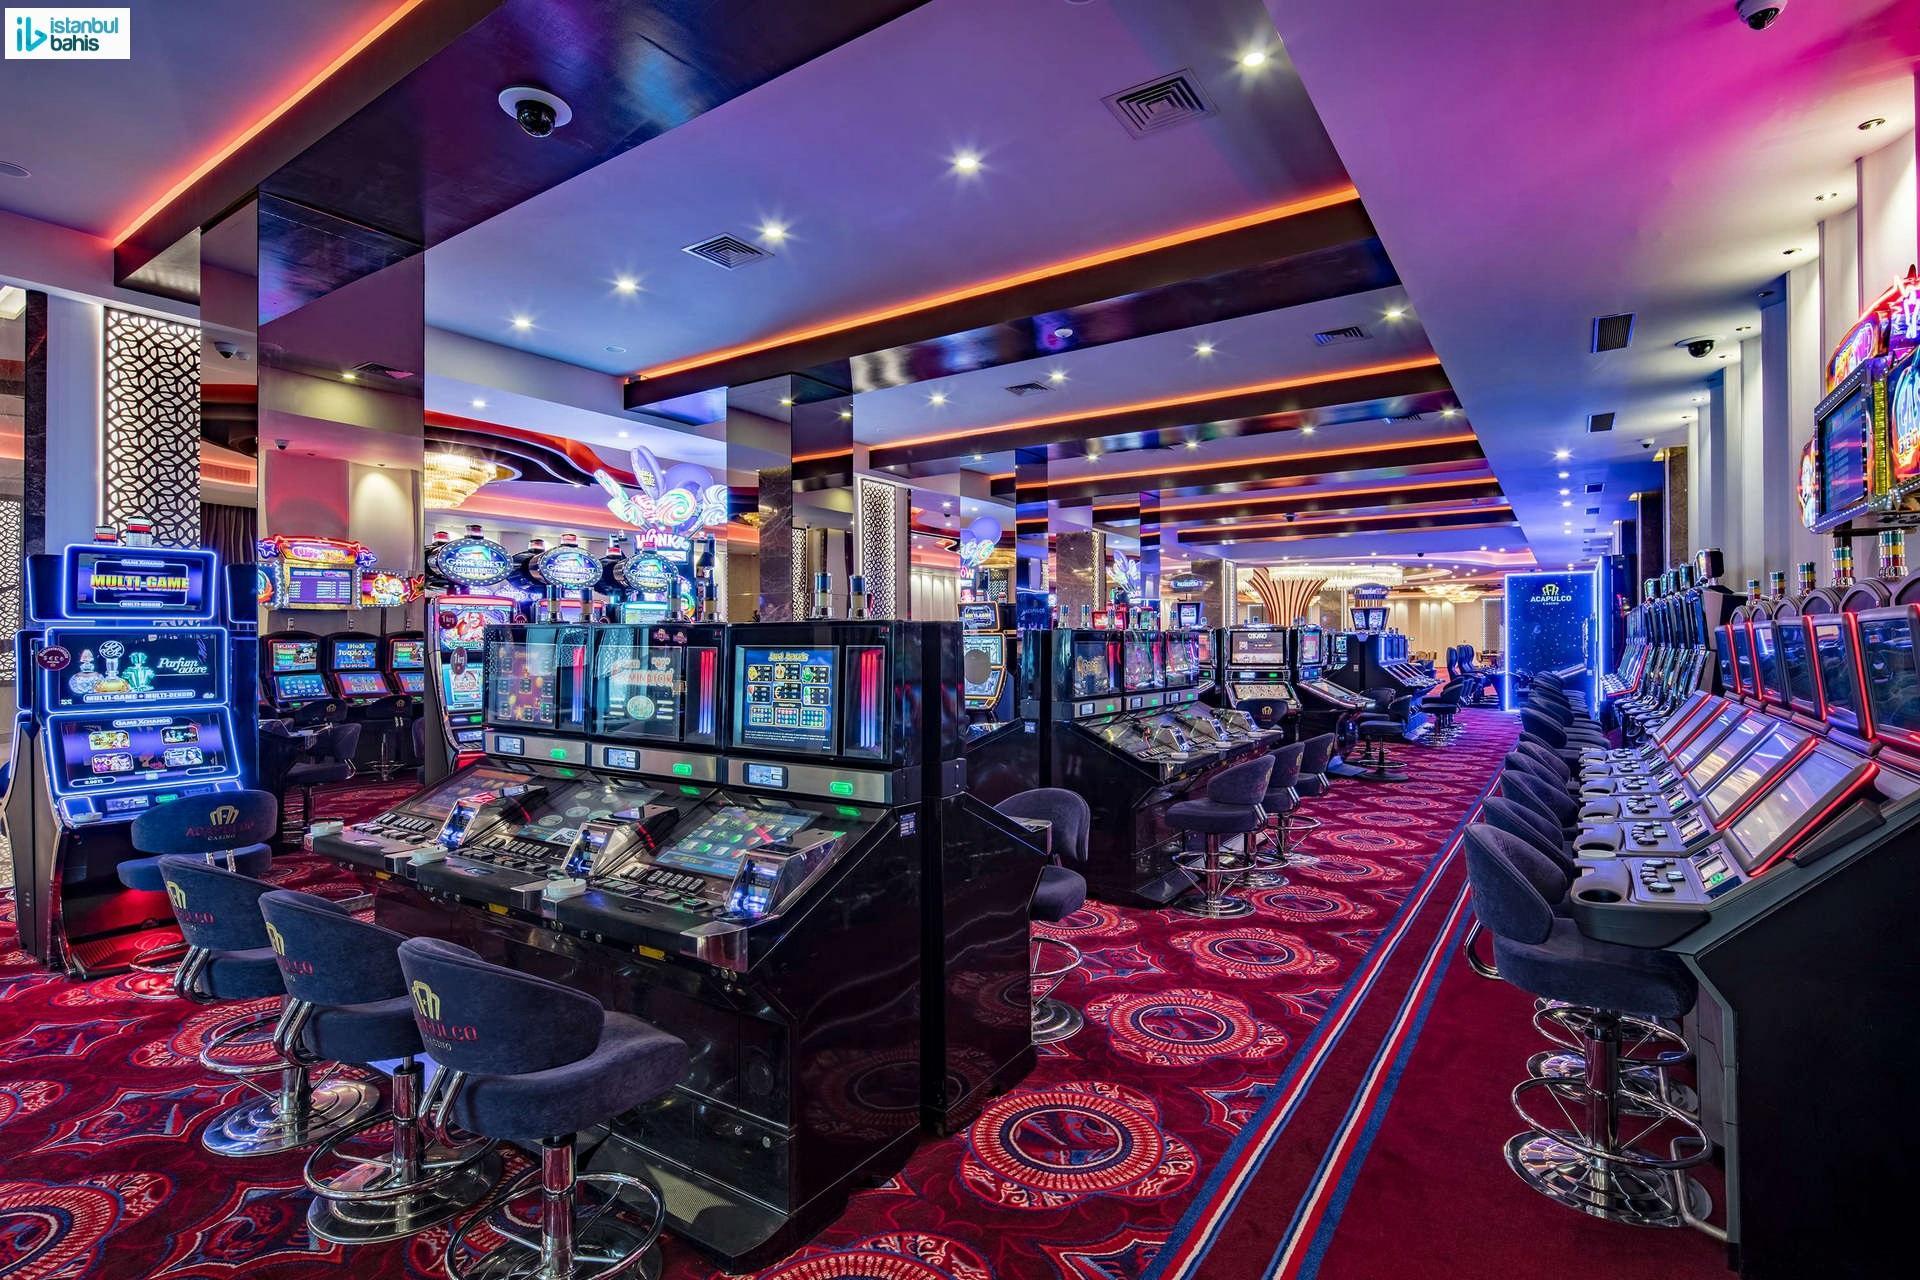 istanbulbahis casino bilgi